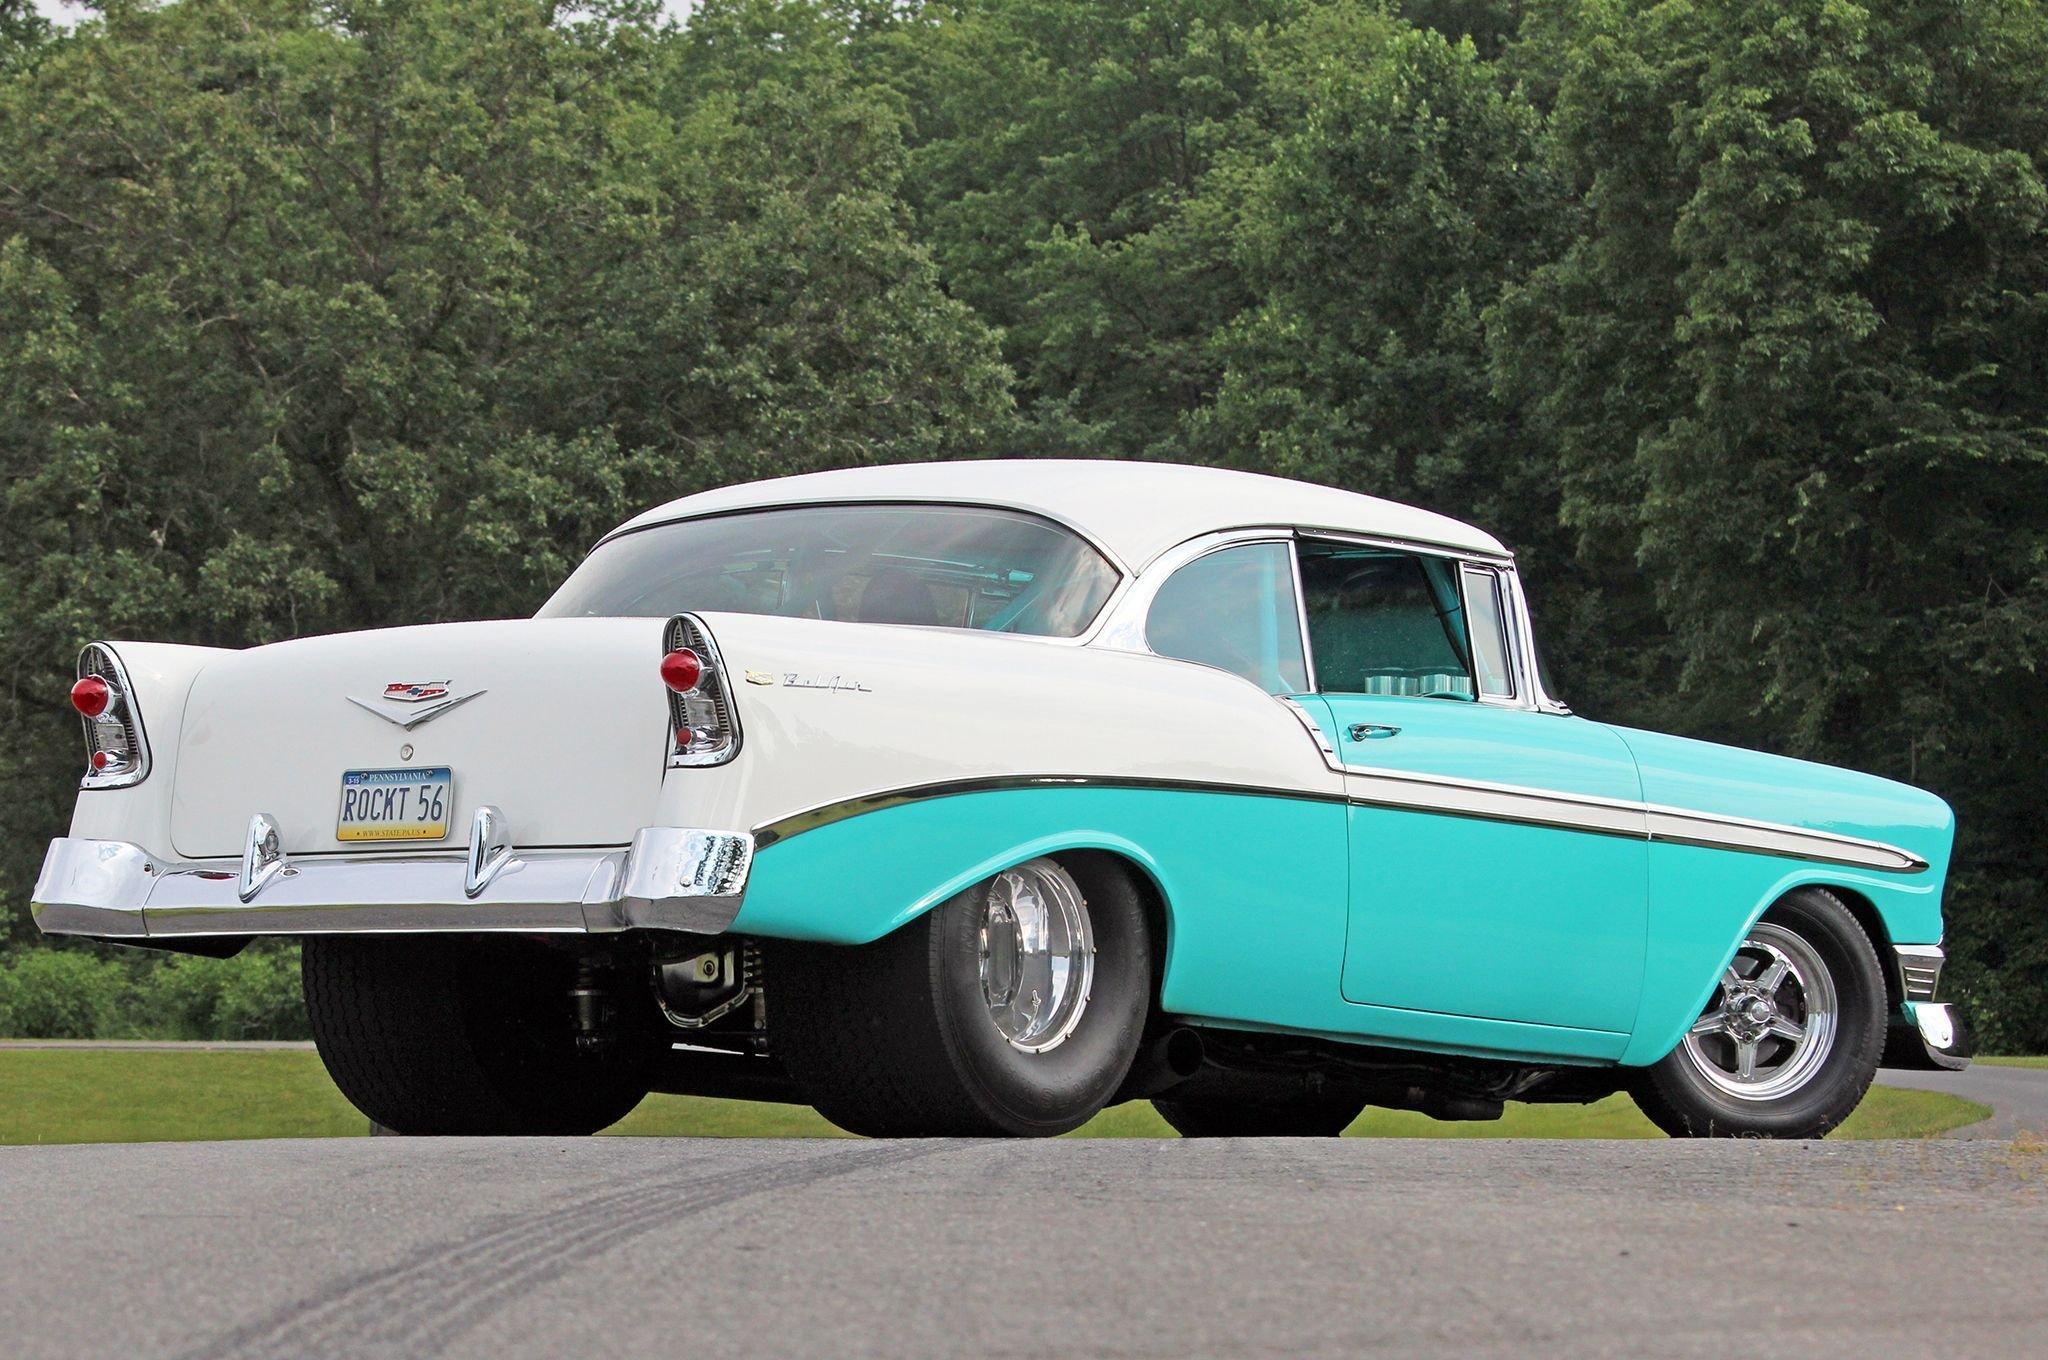 1956 chevrolet chevy bel air coupe hardtop streetrod street rod pro hot drag usa 07 wallpaper